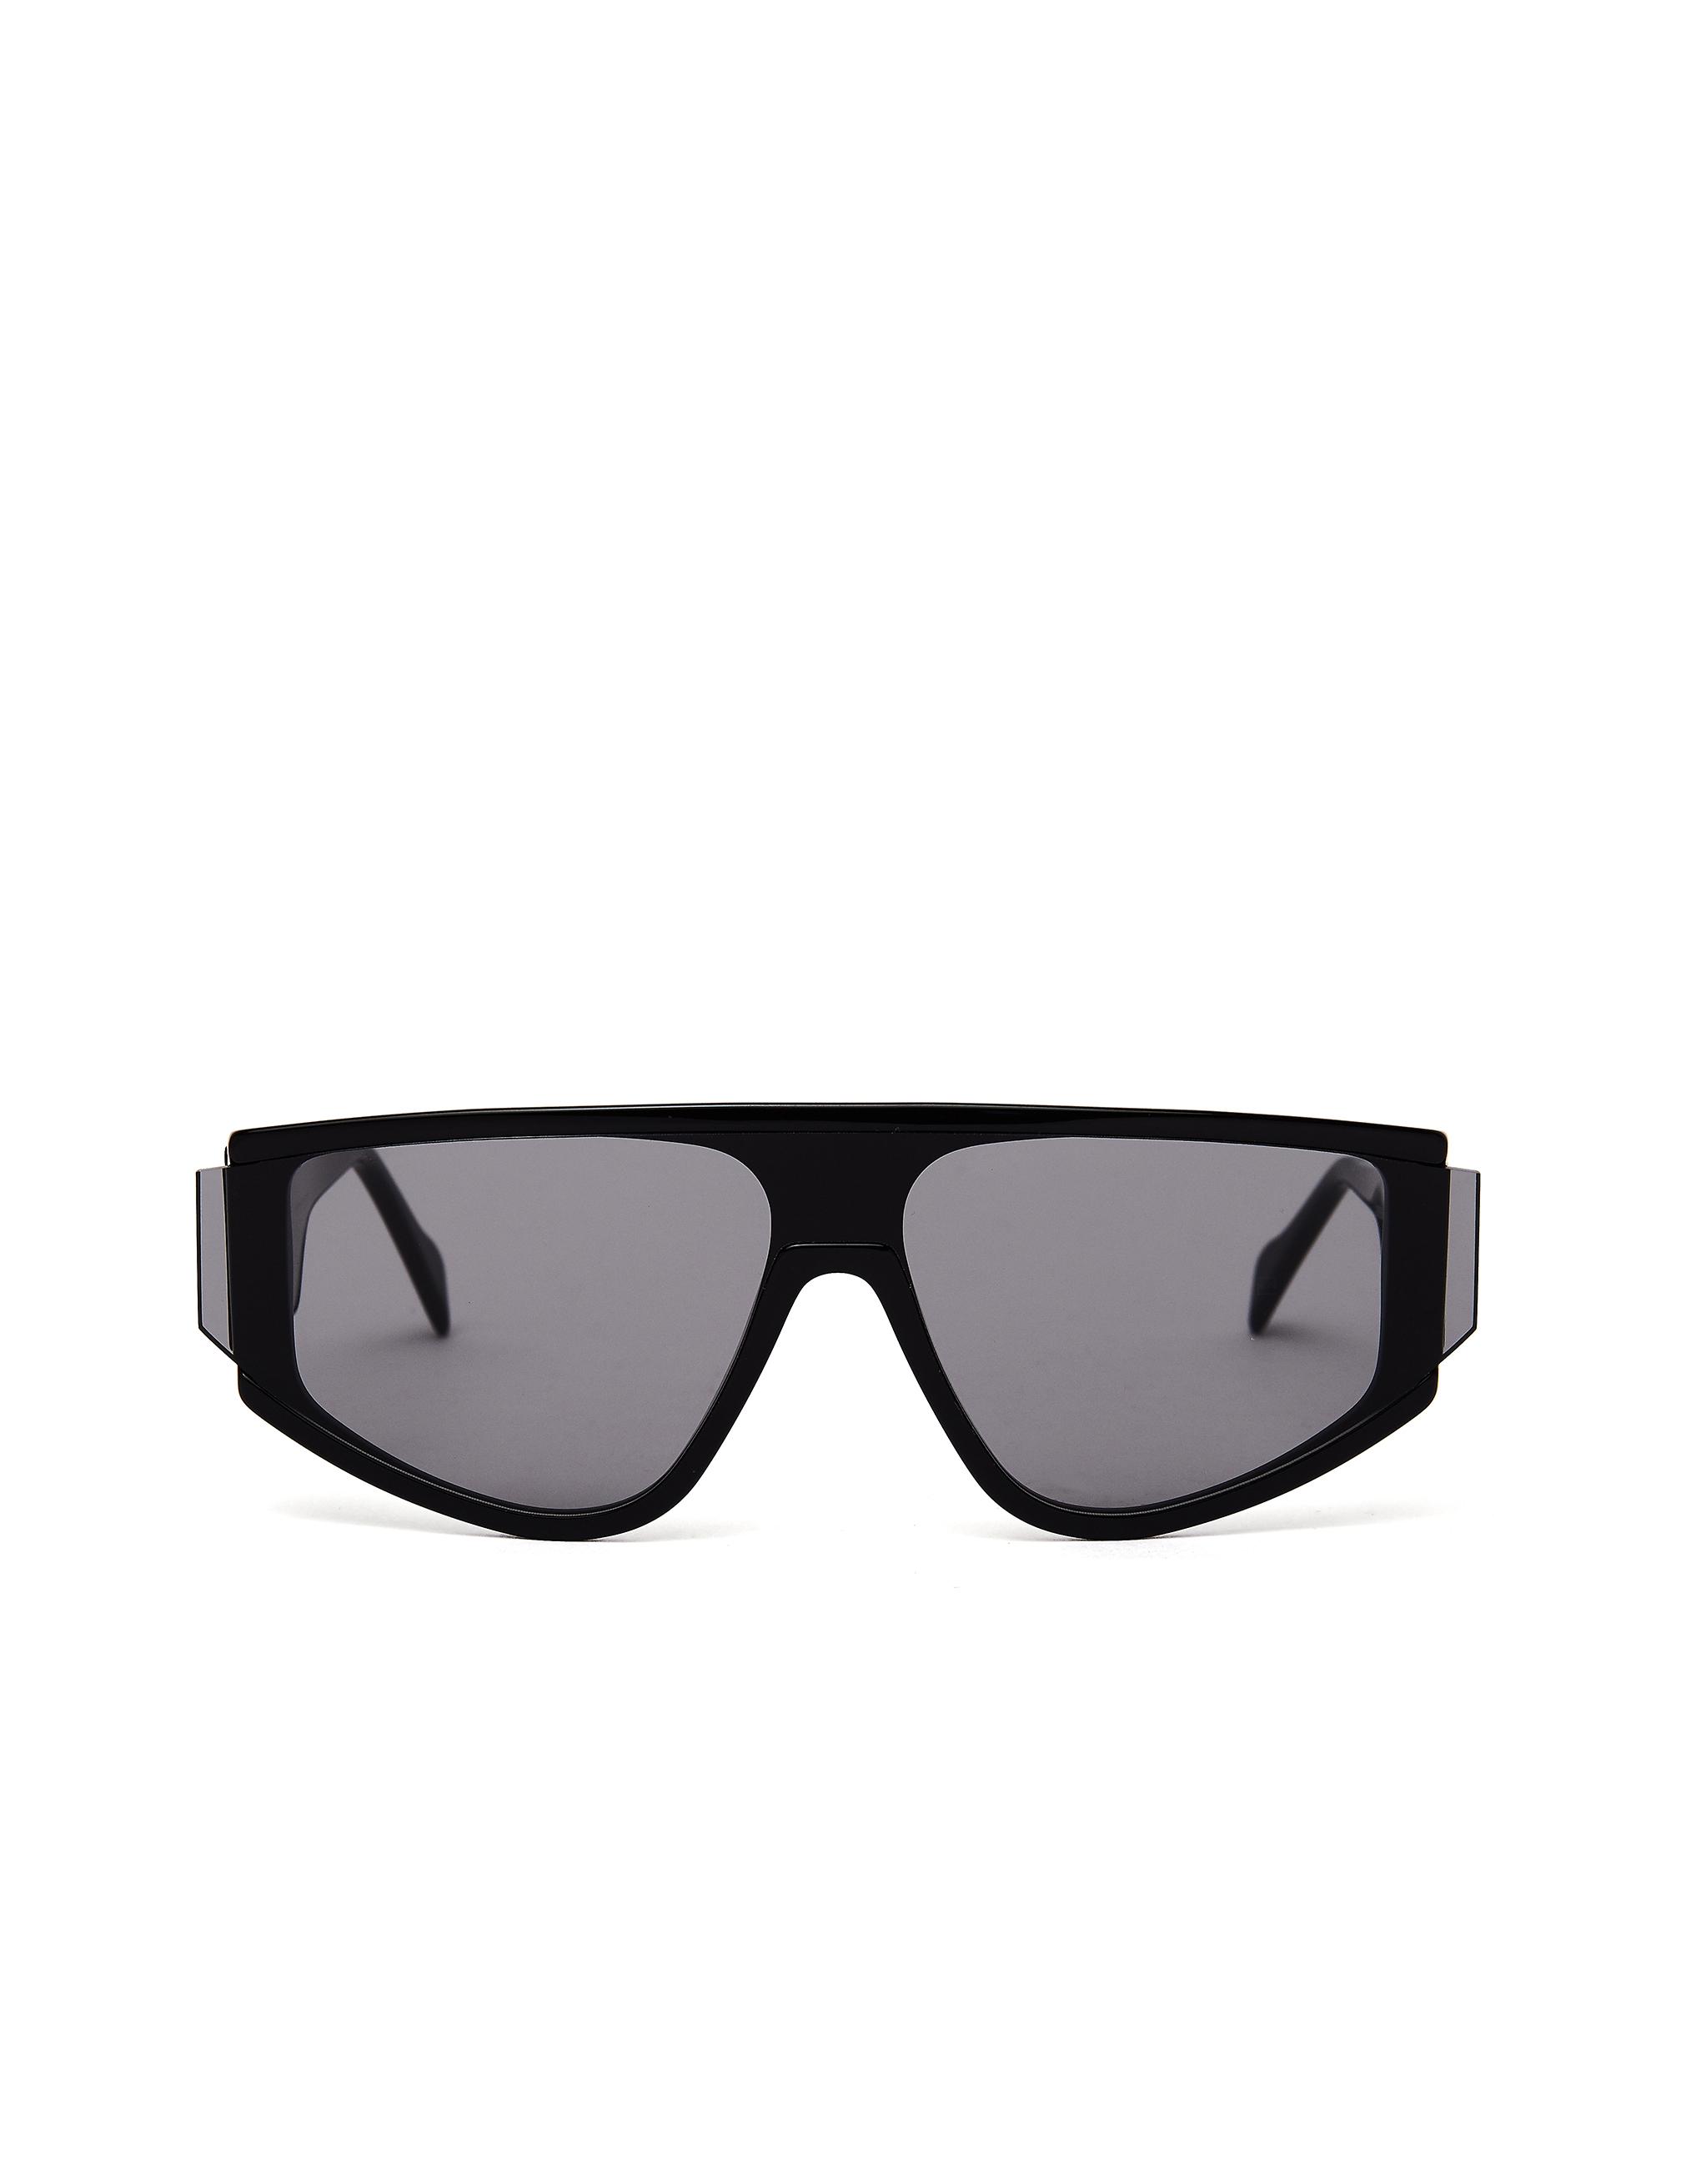 Andy Wolf Black Detweiler Sunglasses